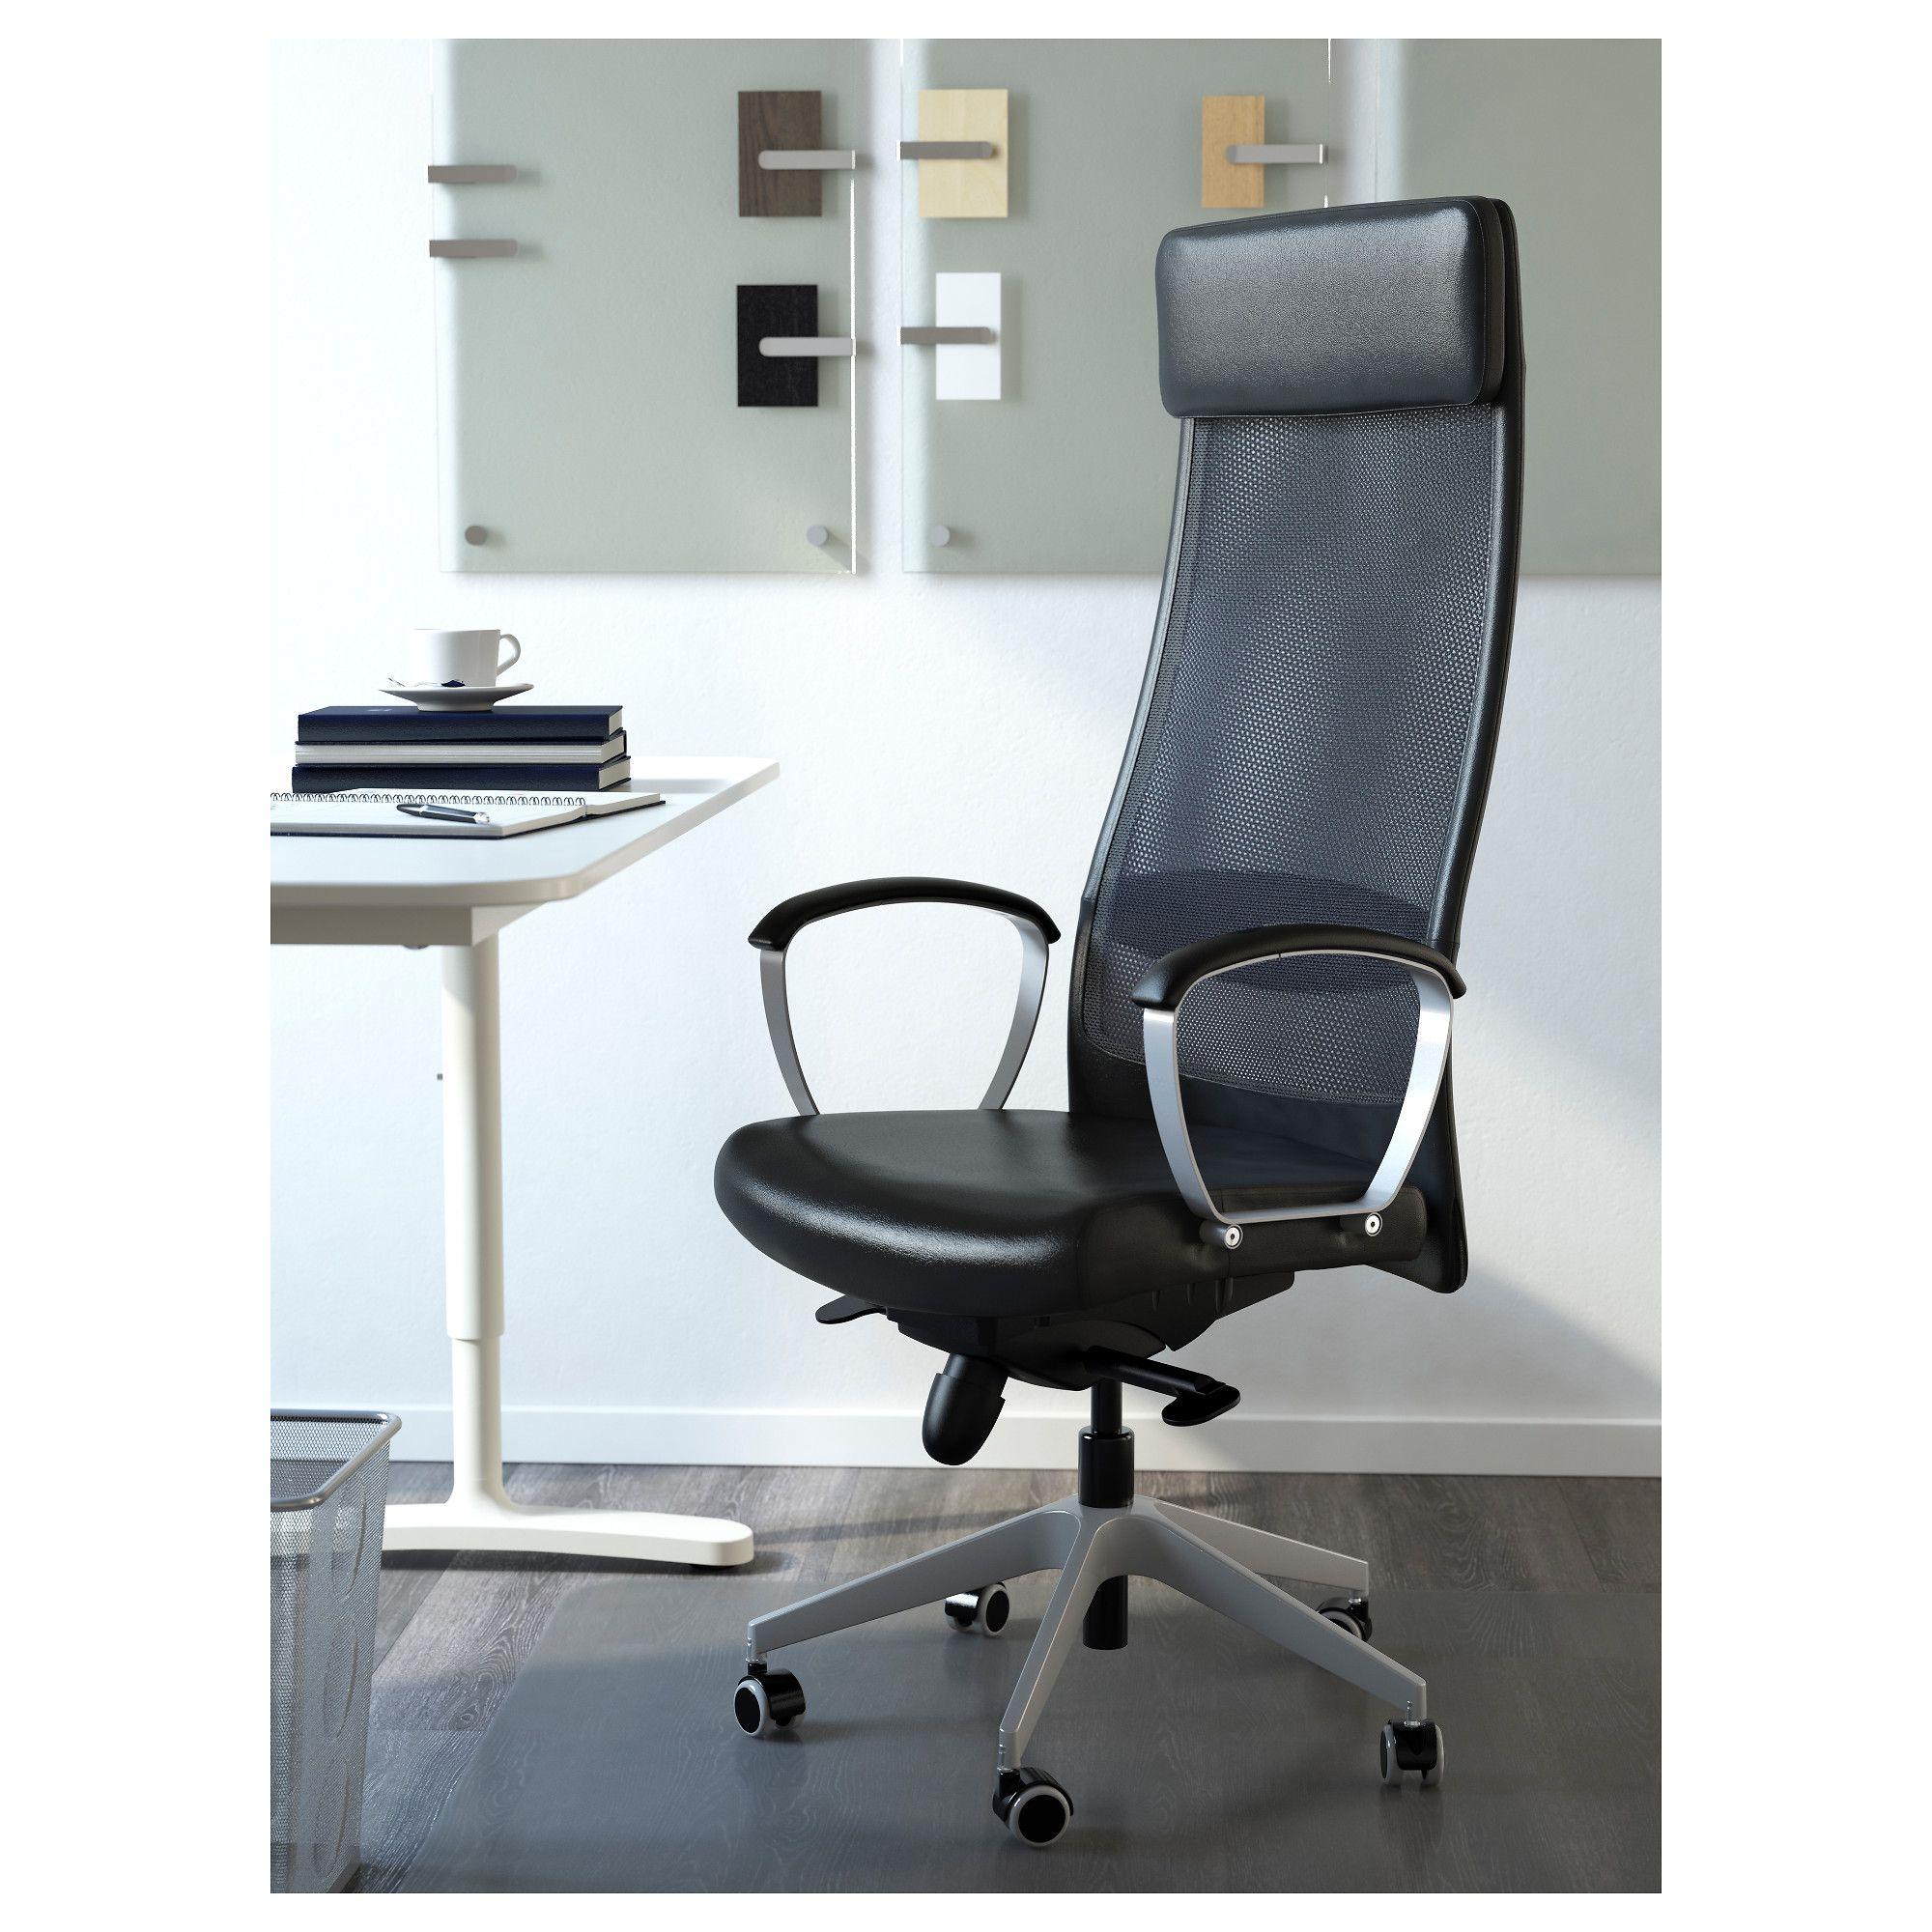 Ikea Markus Chaise De Bureau Noir Glose Robust Chaise Bureau Chaise Bureau Ikea Et Chaise Fauteuil